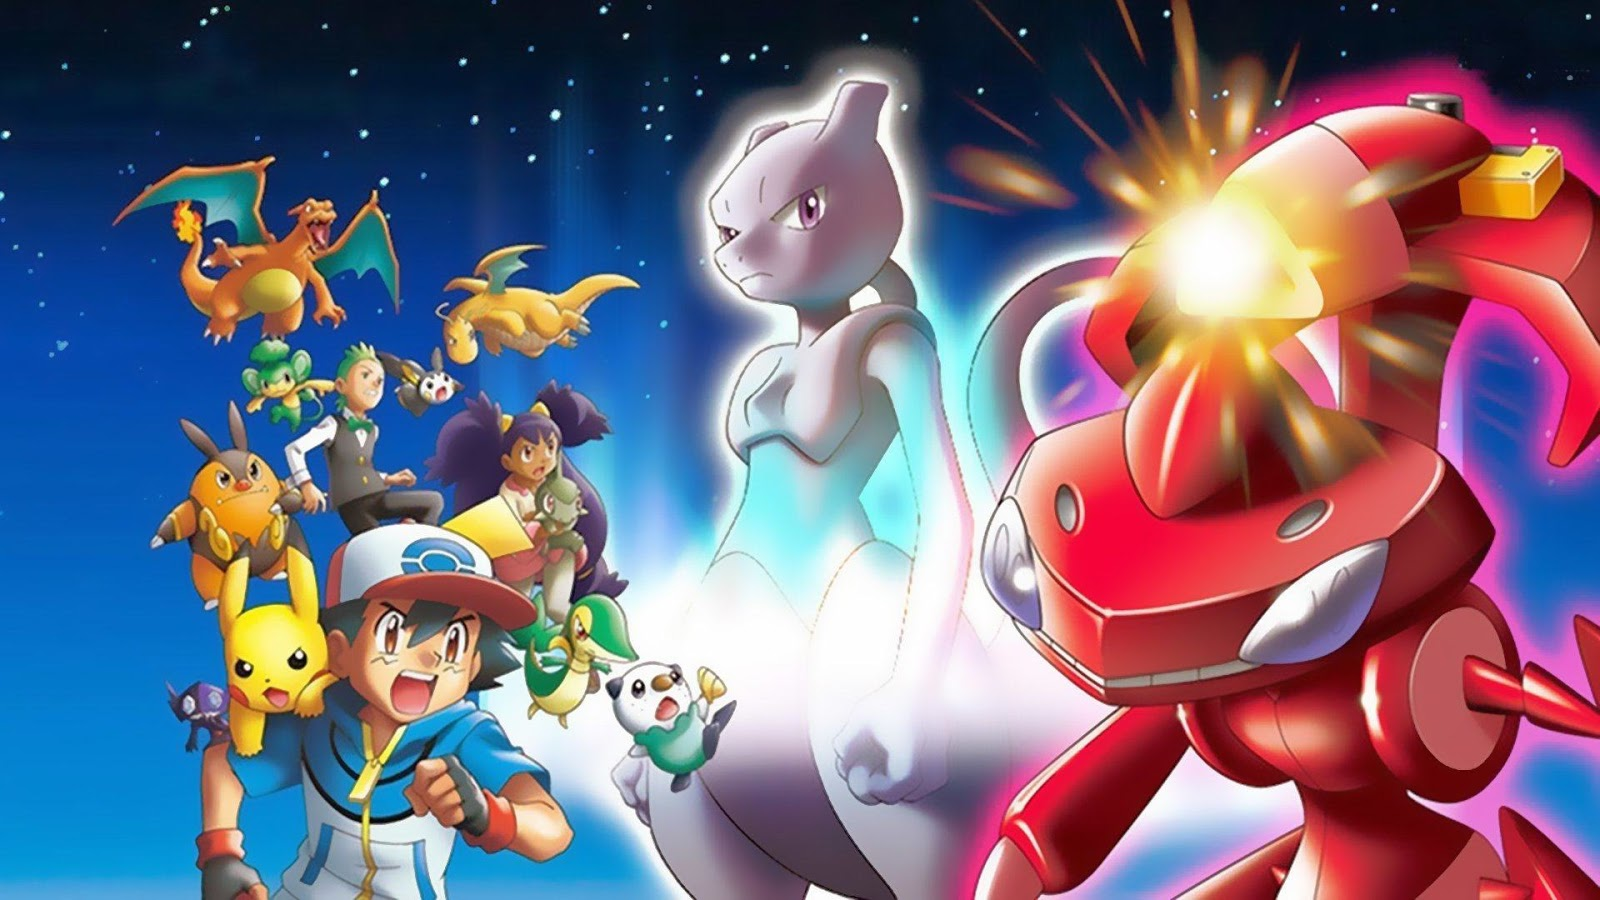 Pokémon películas completas en español latino